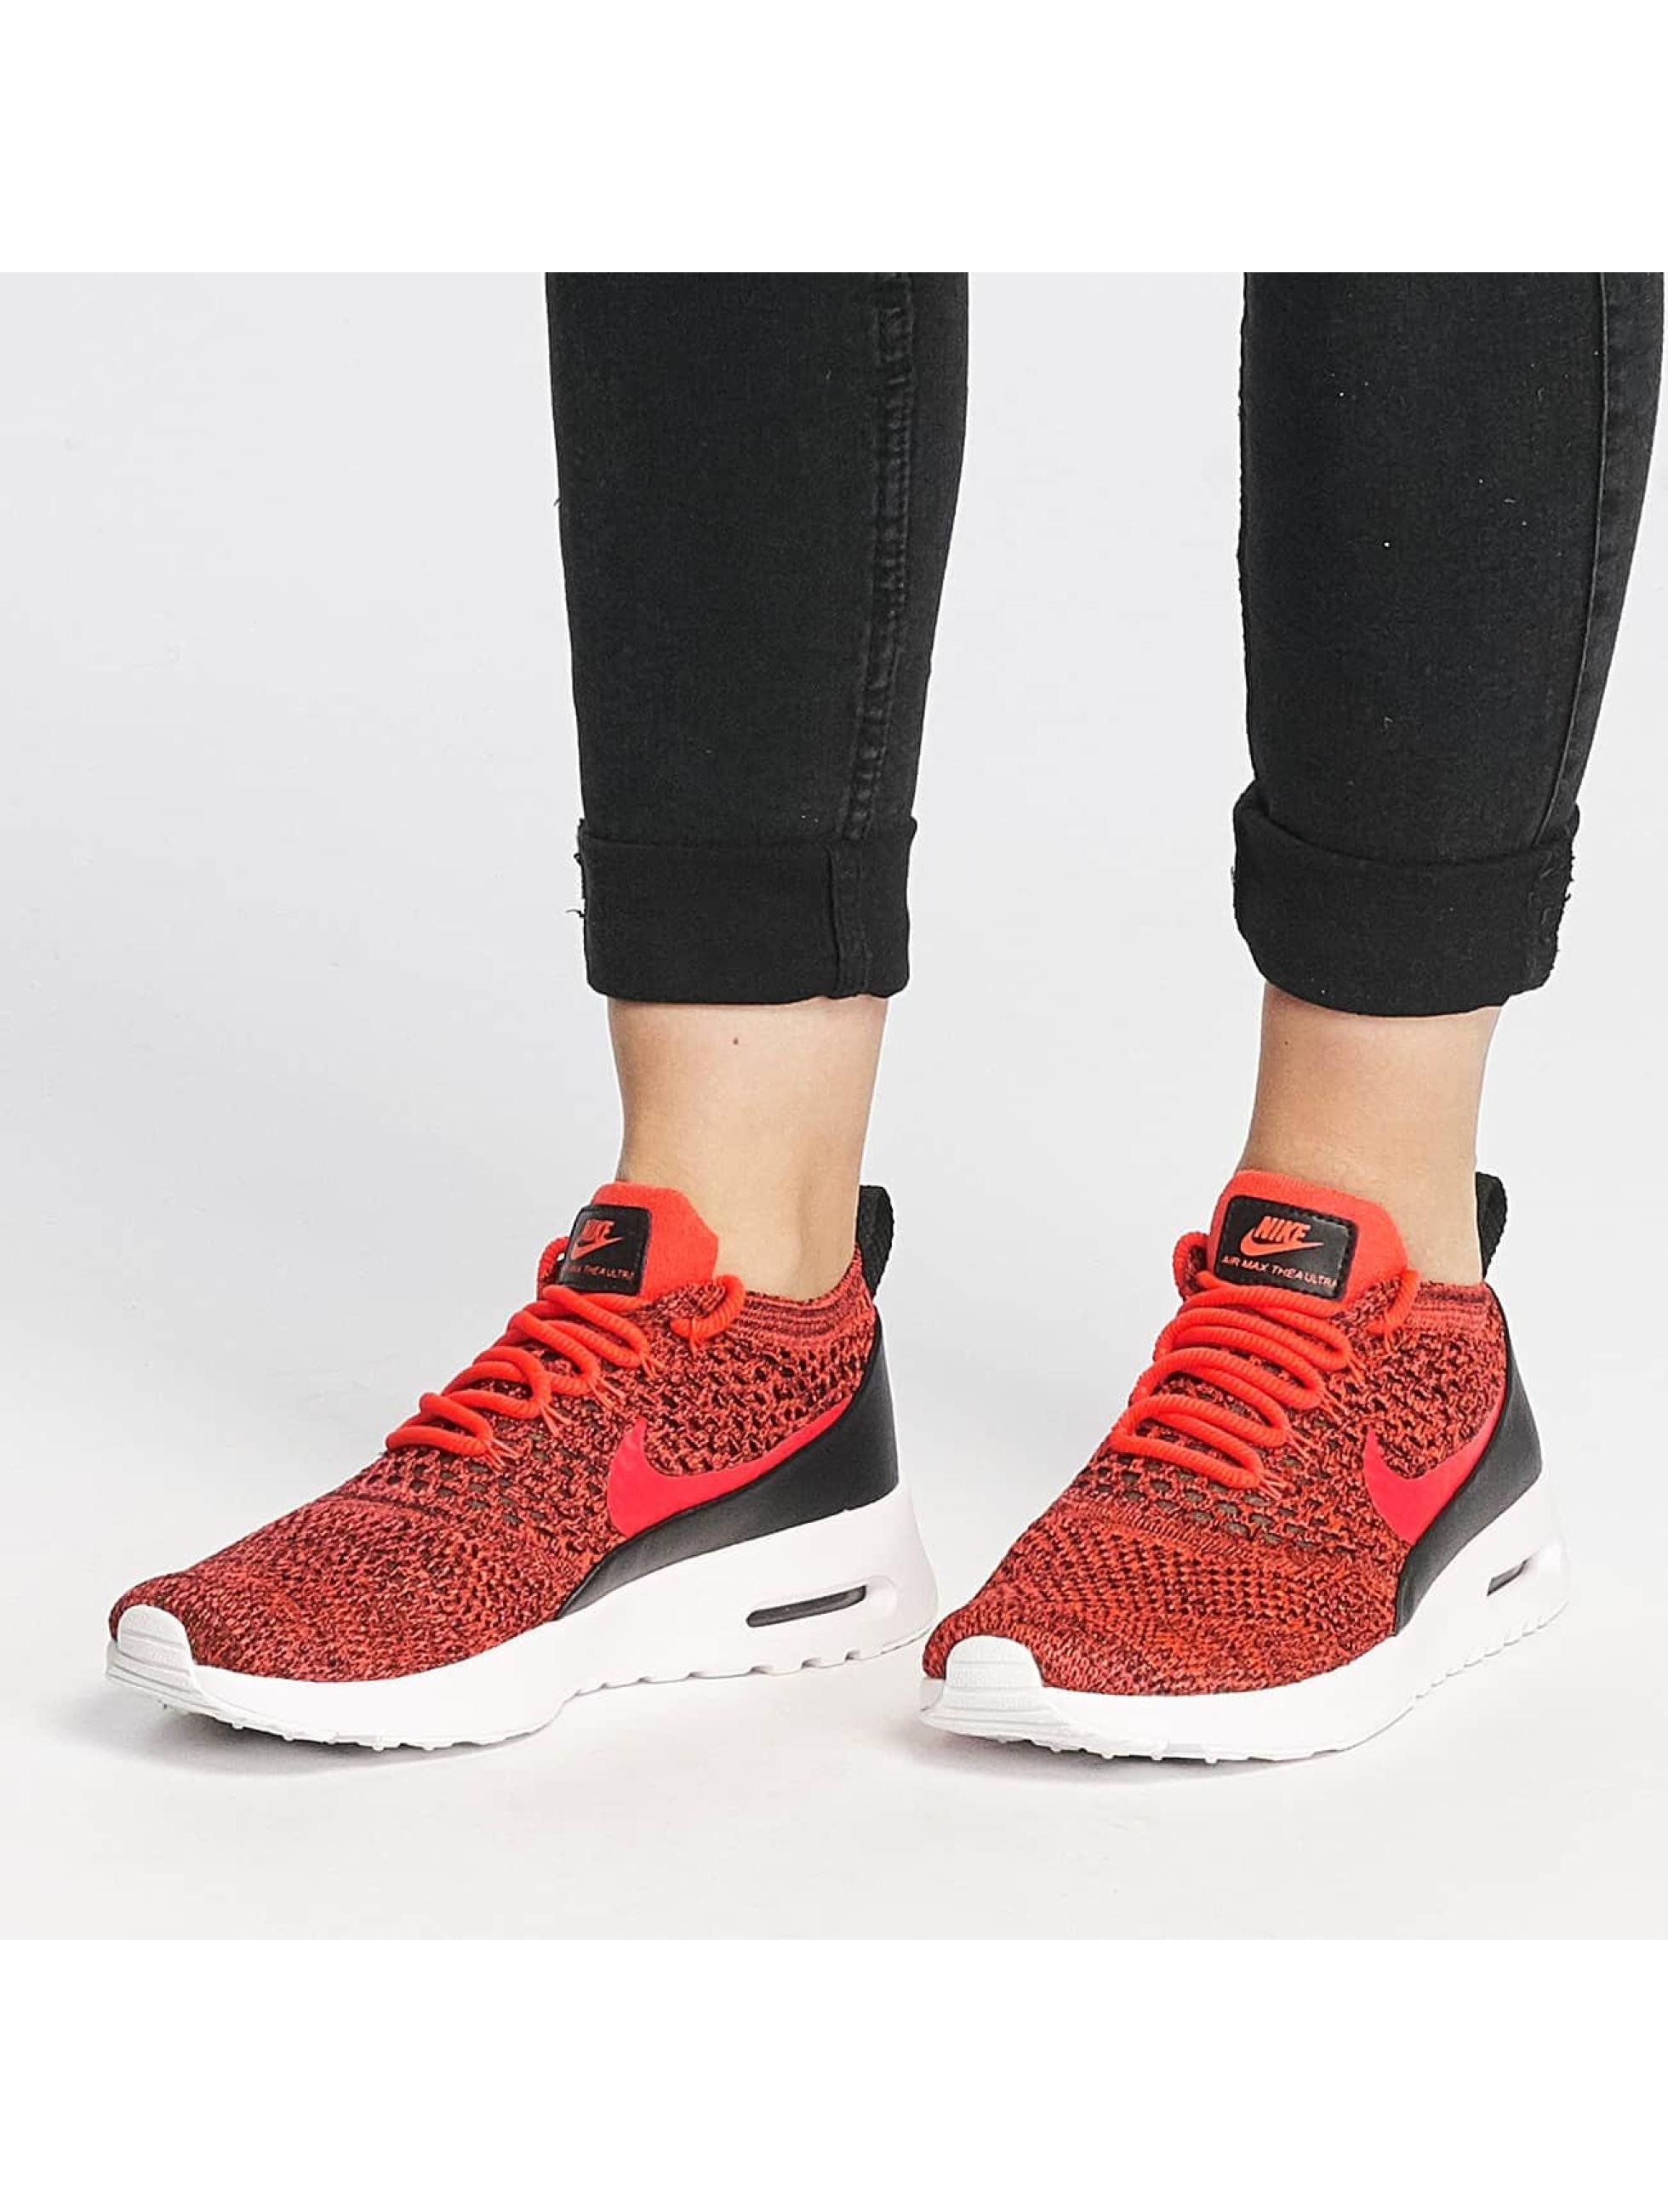 Nike Zapatillas de deporte Air Max Thea Ultra Flyknit rojo